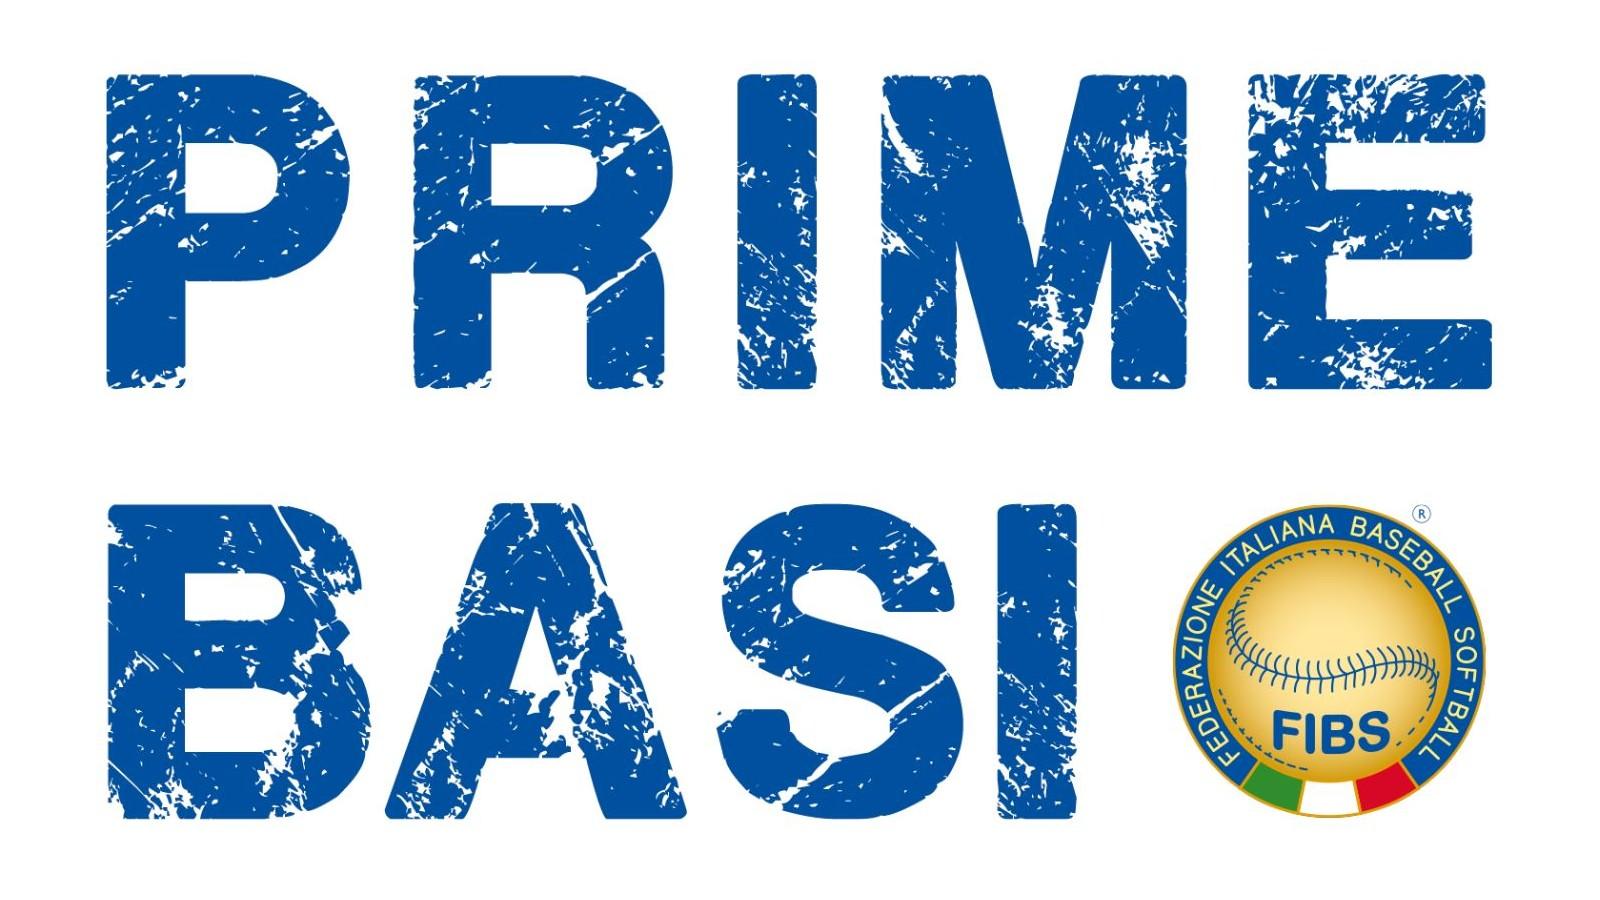 Prime-Basi-Logo--Leo-Burnett-